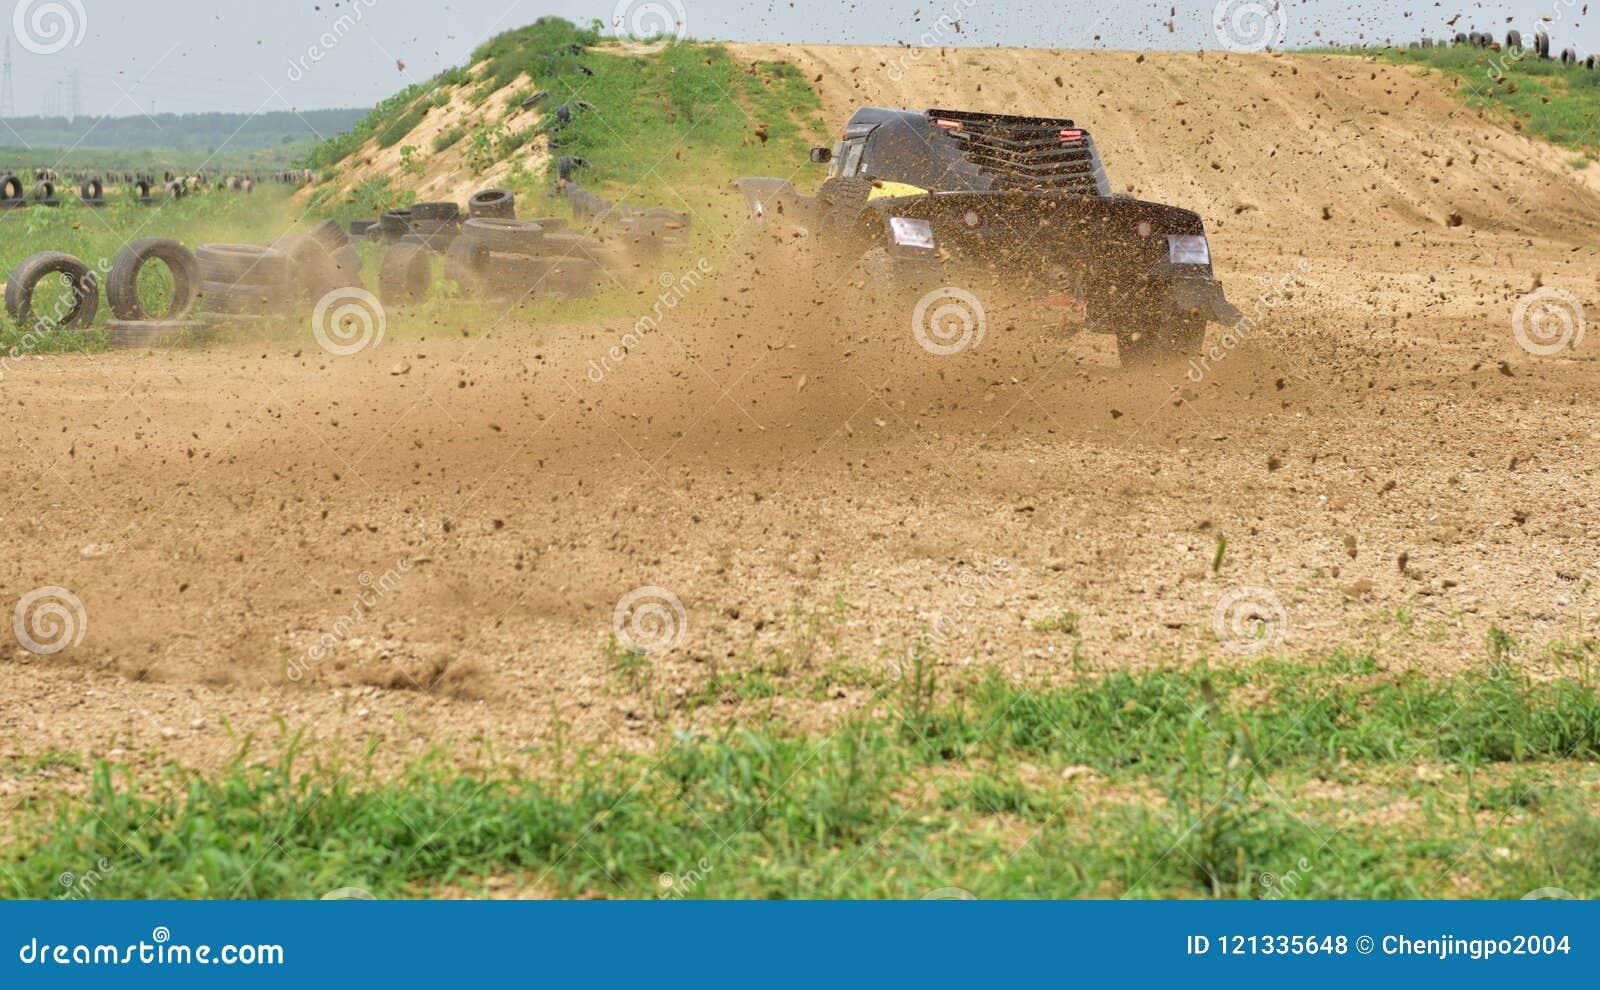 A racing car running at a high speed